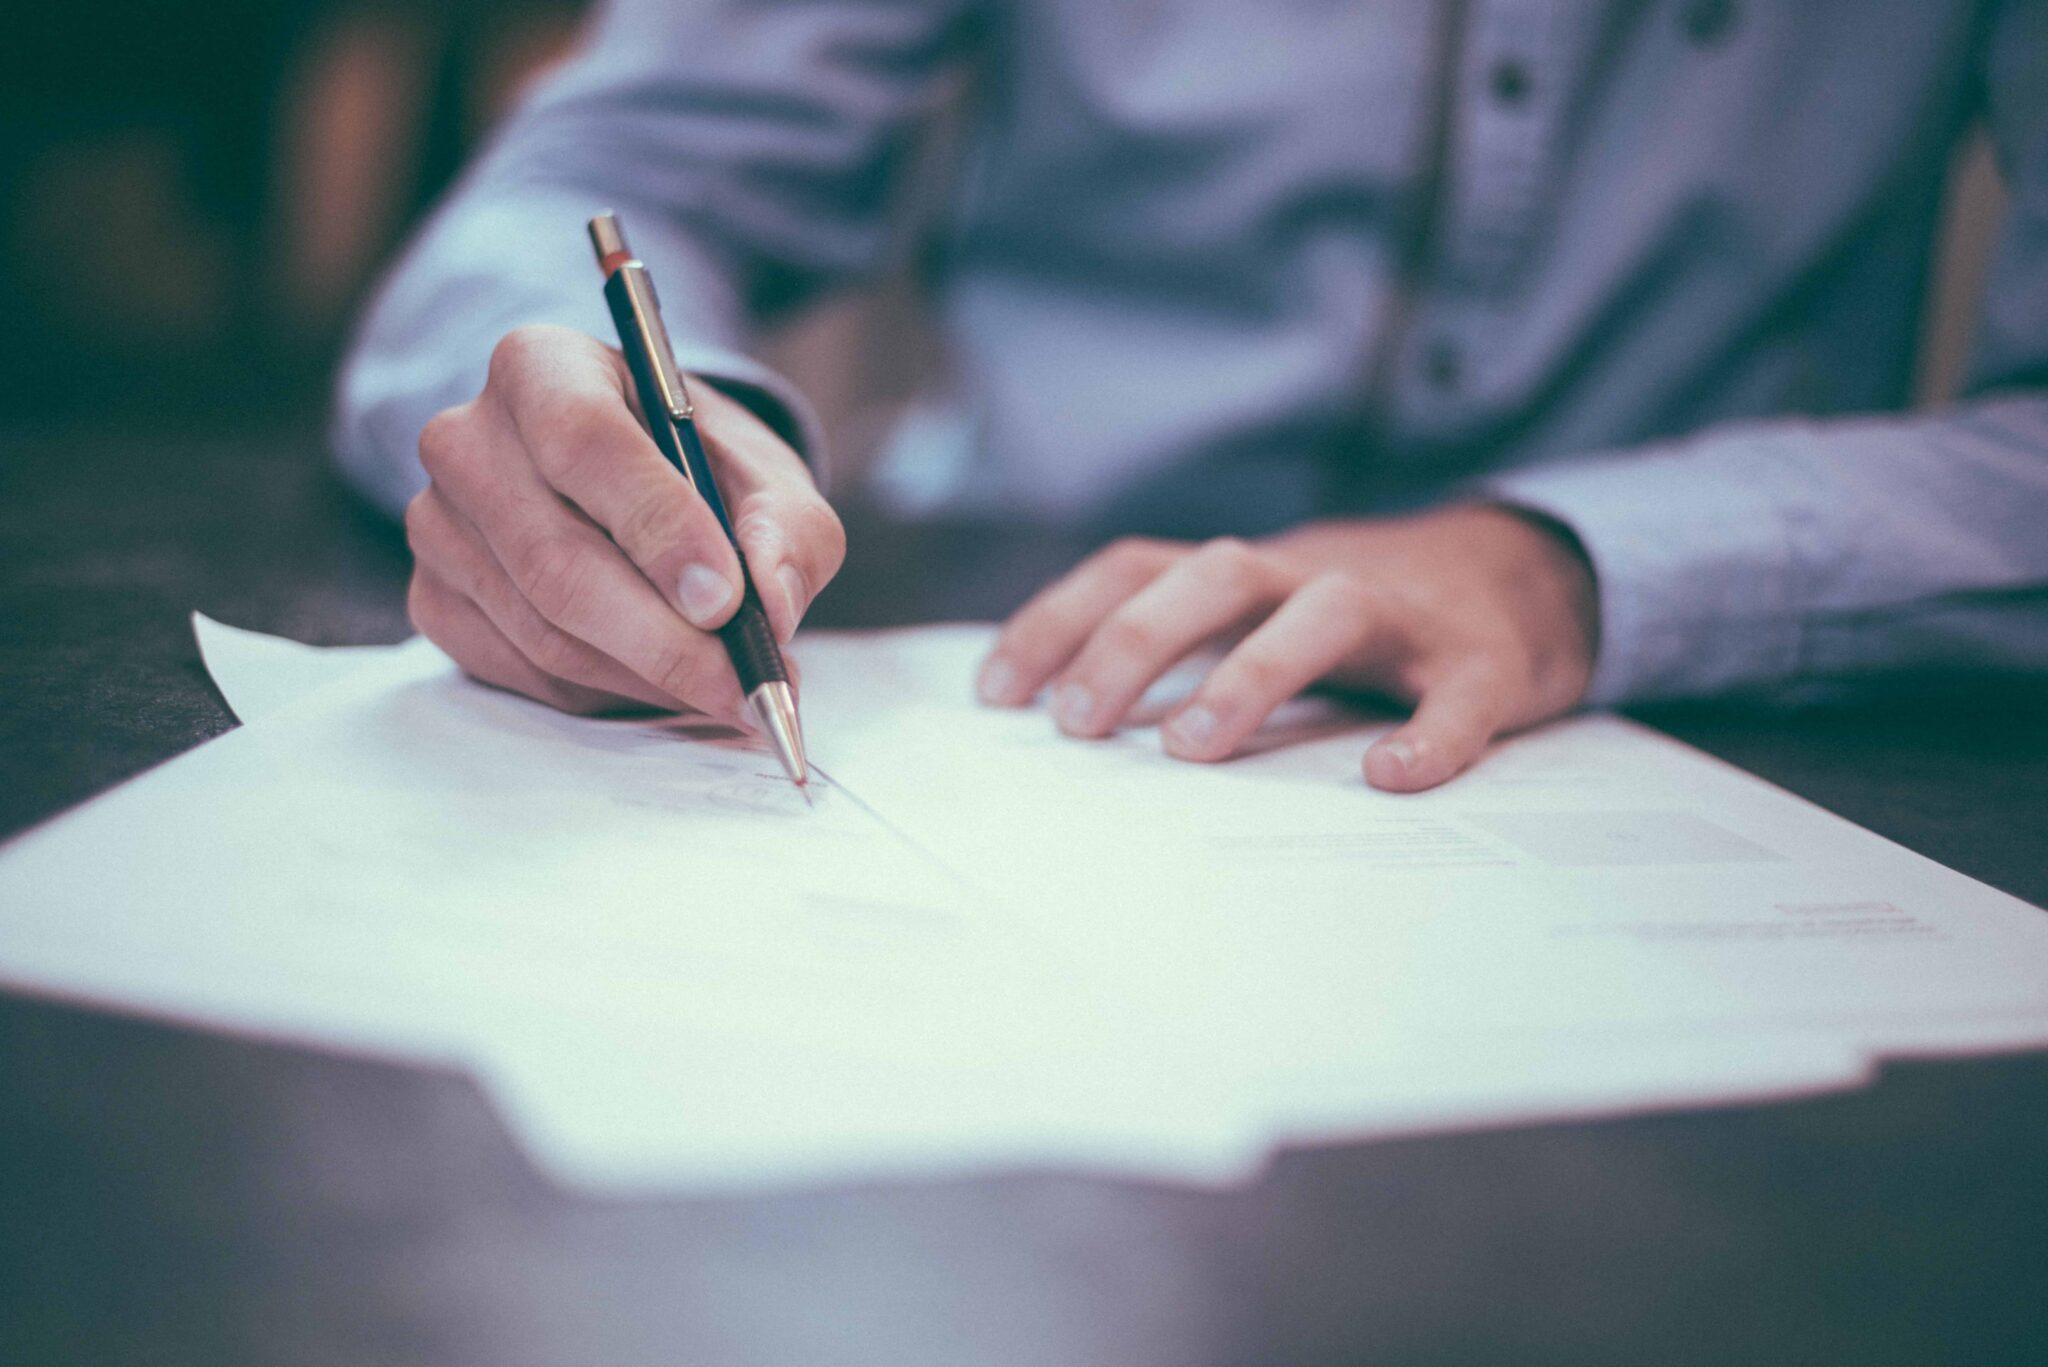 Professional Indemnity & Professional Risks